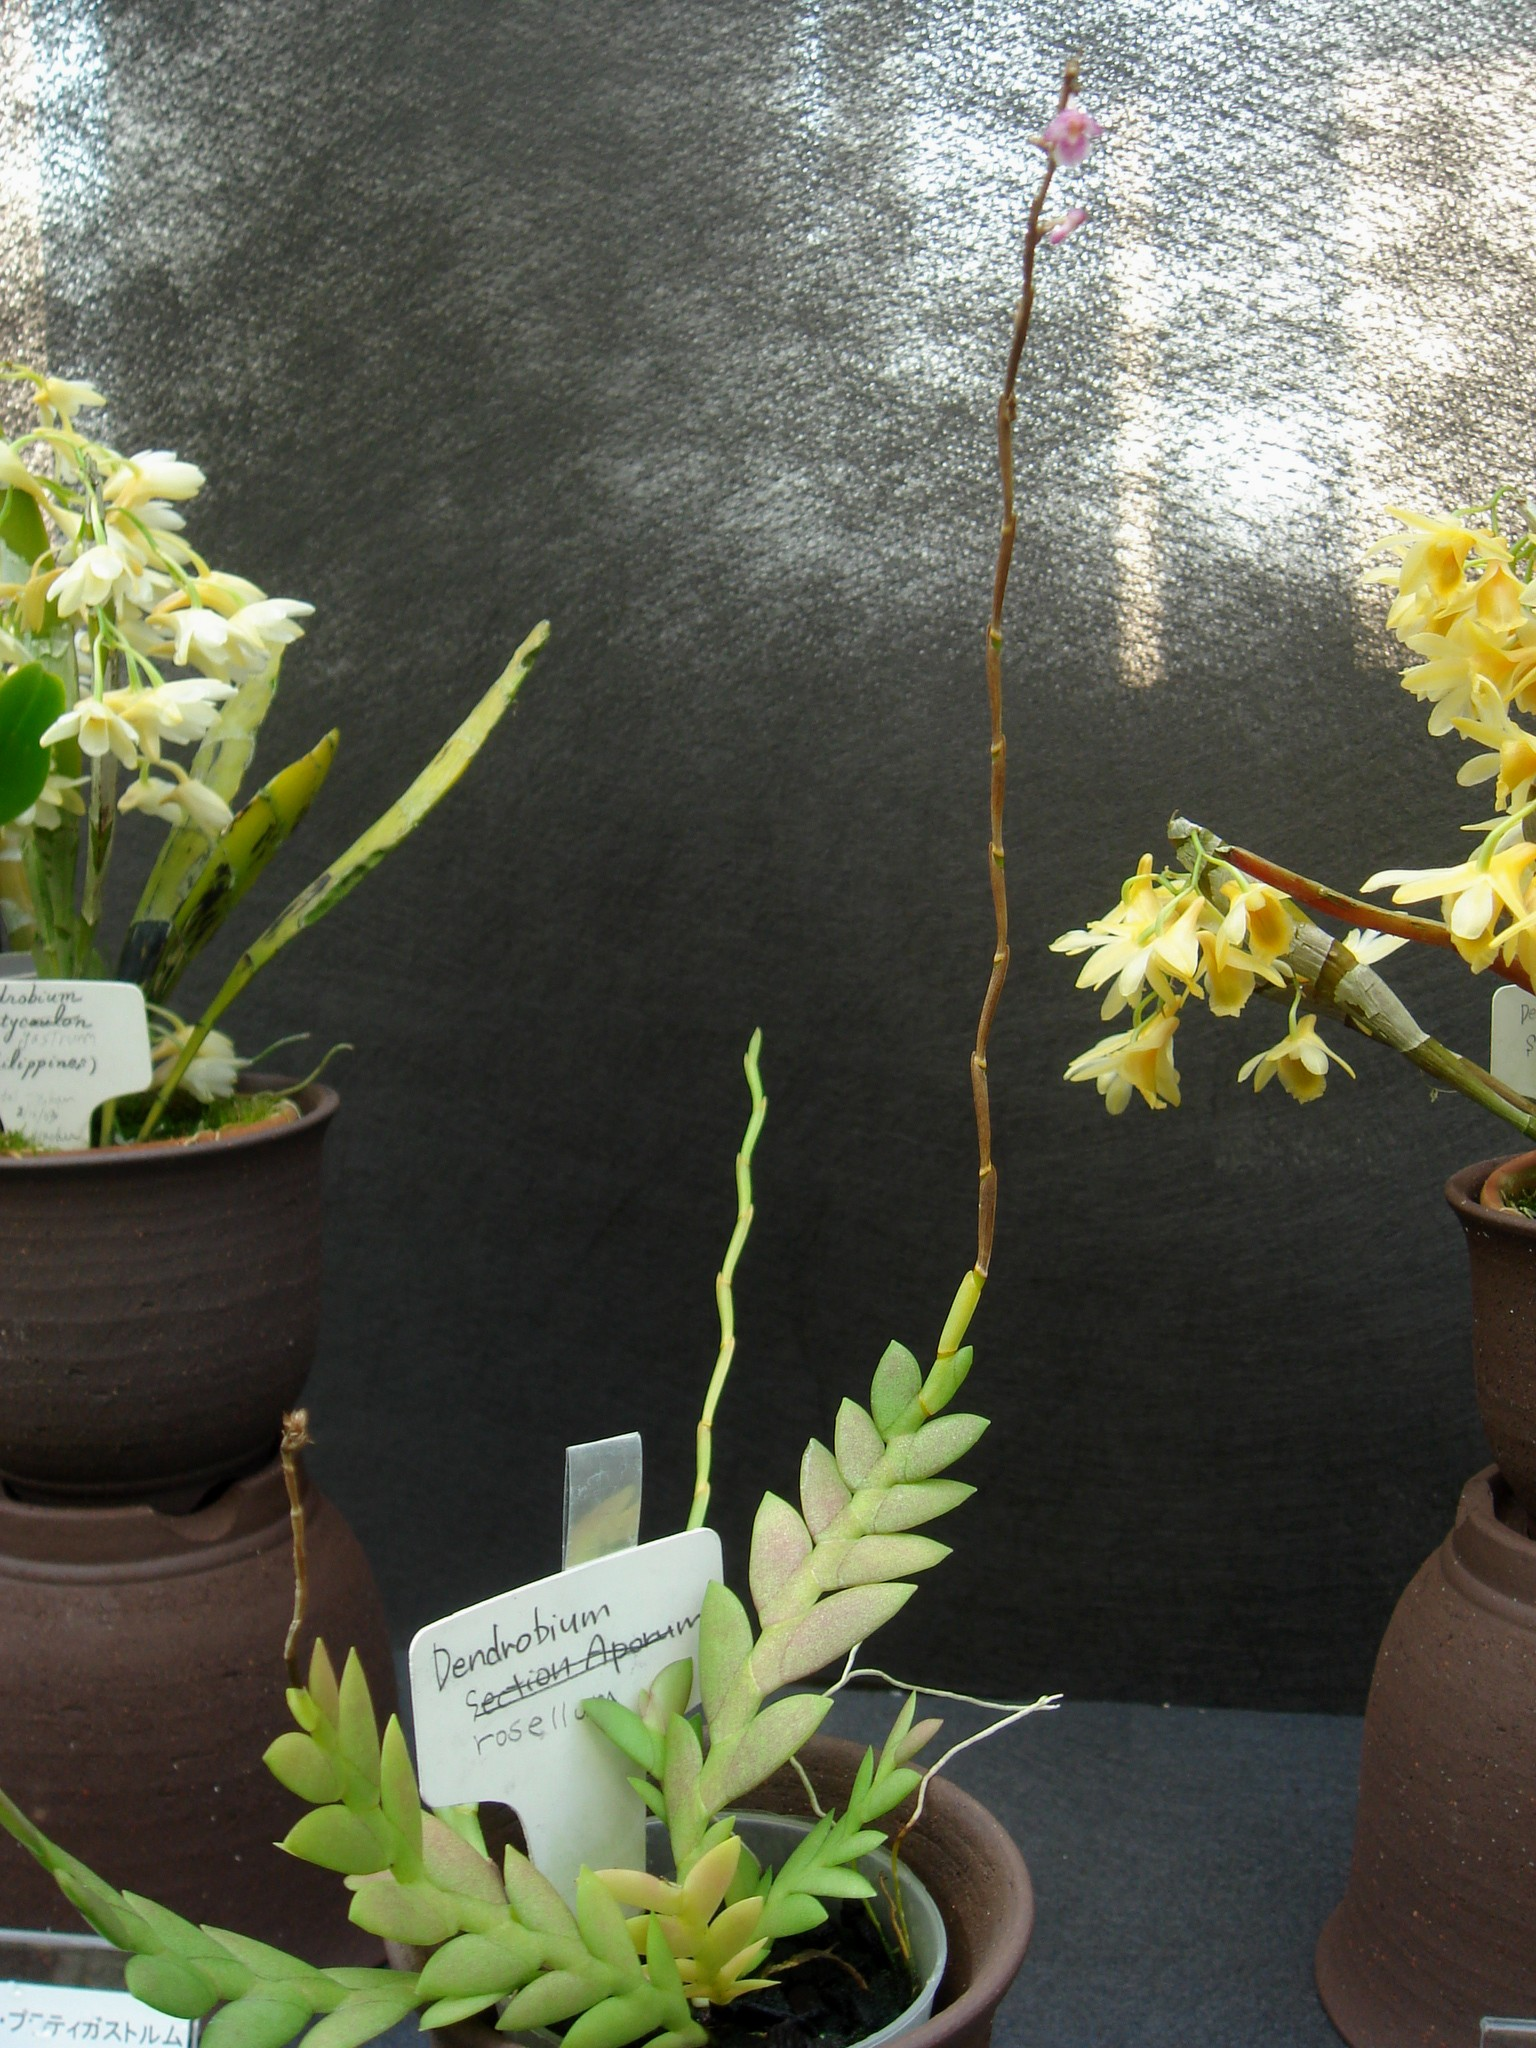 http://orchids.la.coocan.jp/Dendrobium/Dendrobium%20rosellum/DSC01412.JPG